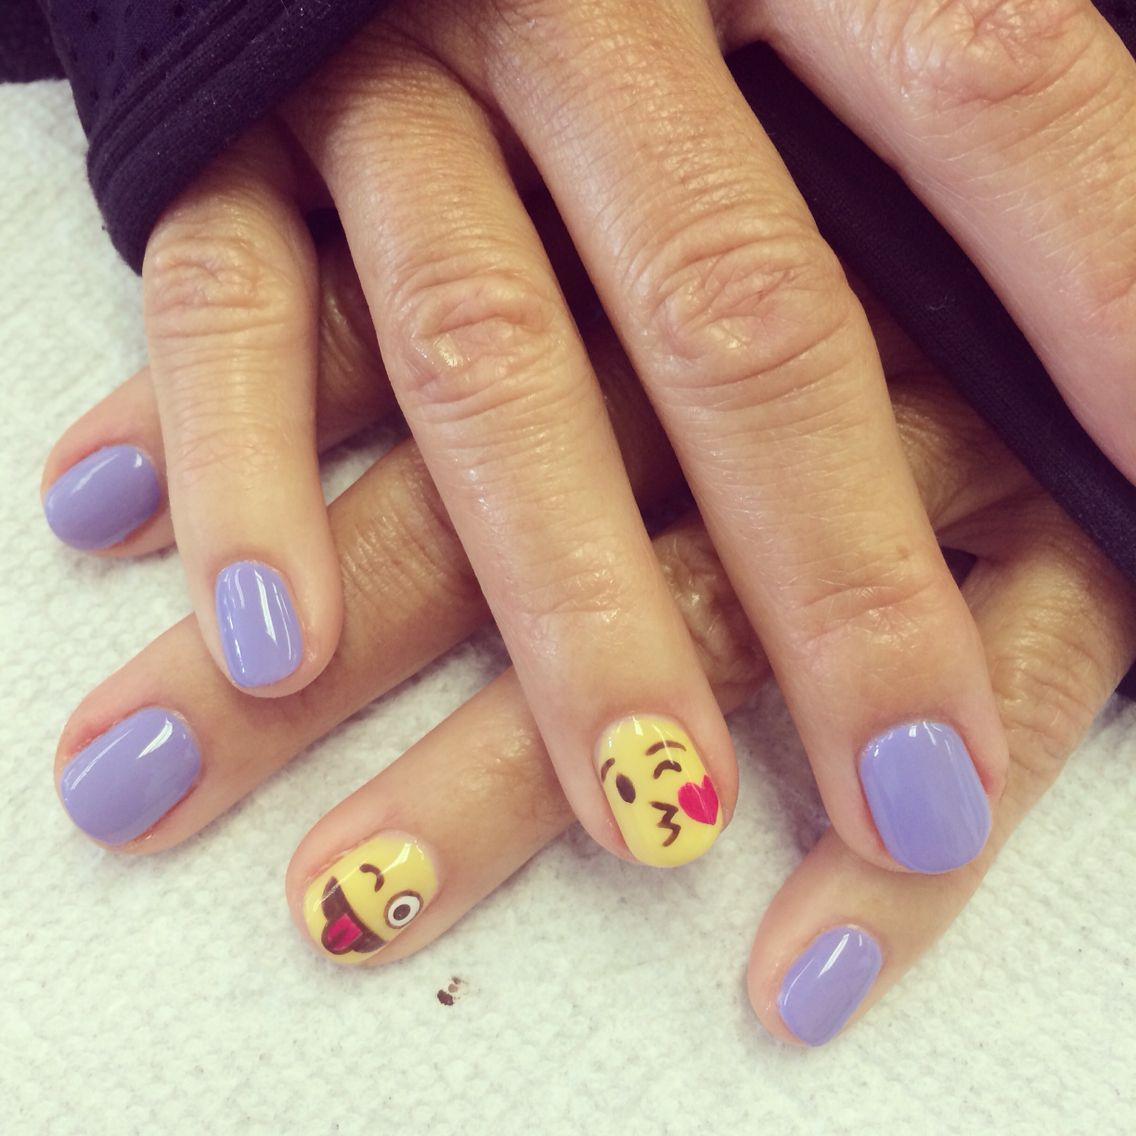 Emoji nail art design - Emoji Nails My Nail Art Pinterest Emoji Nails, Emoji And